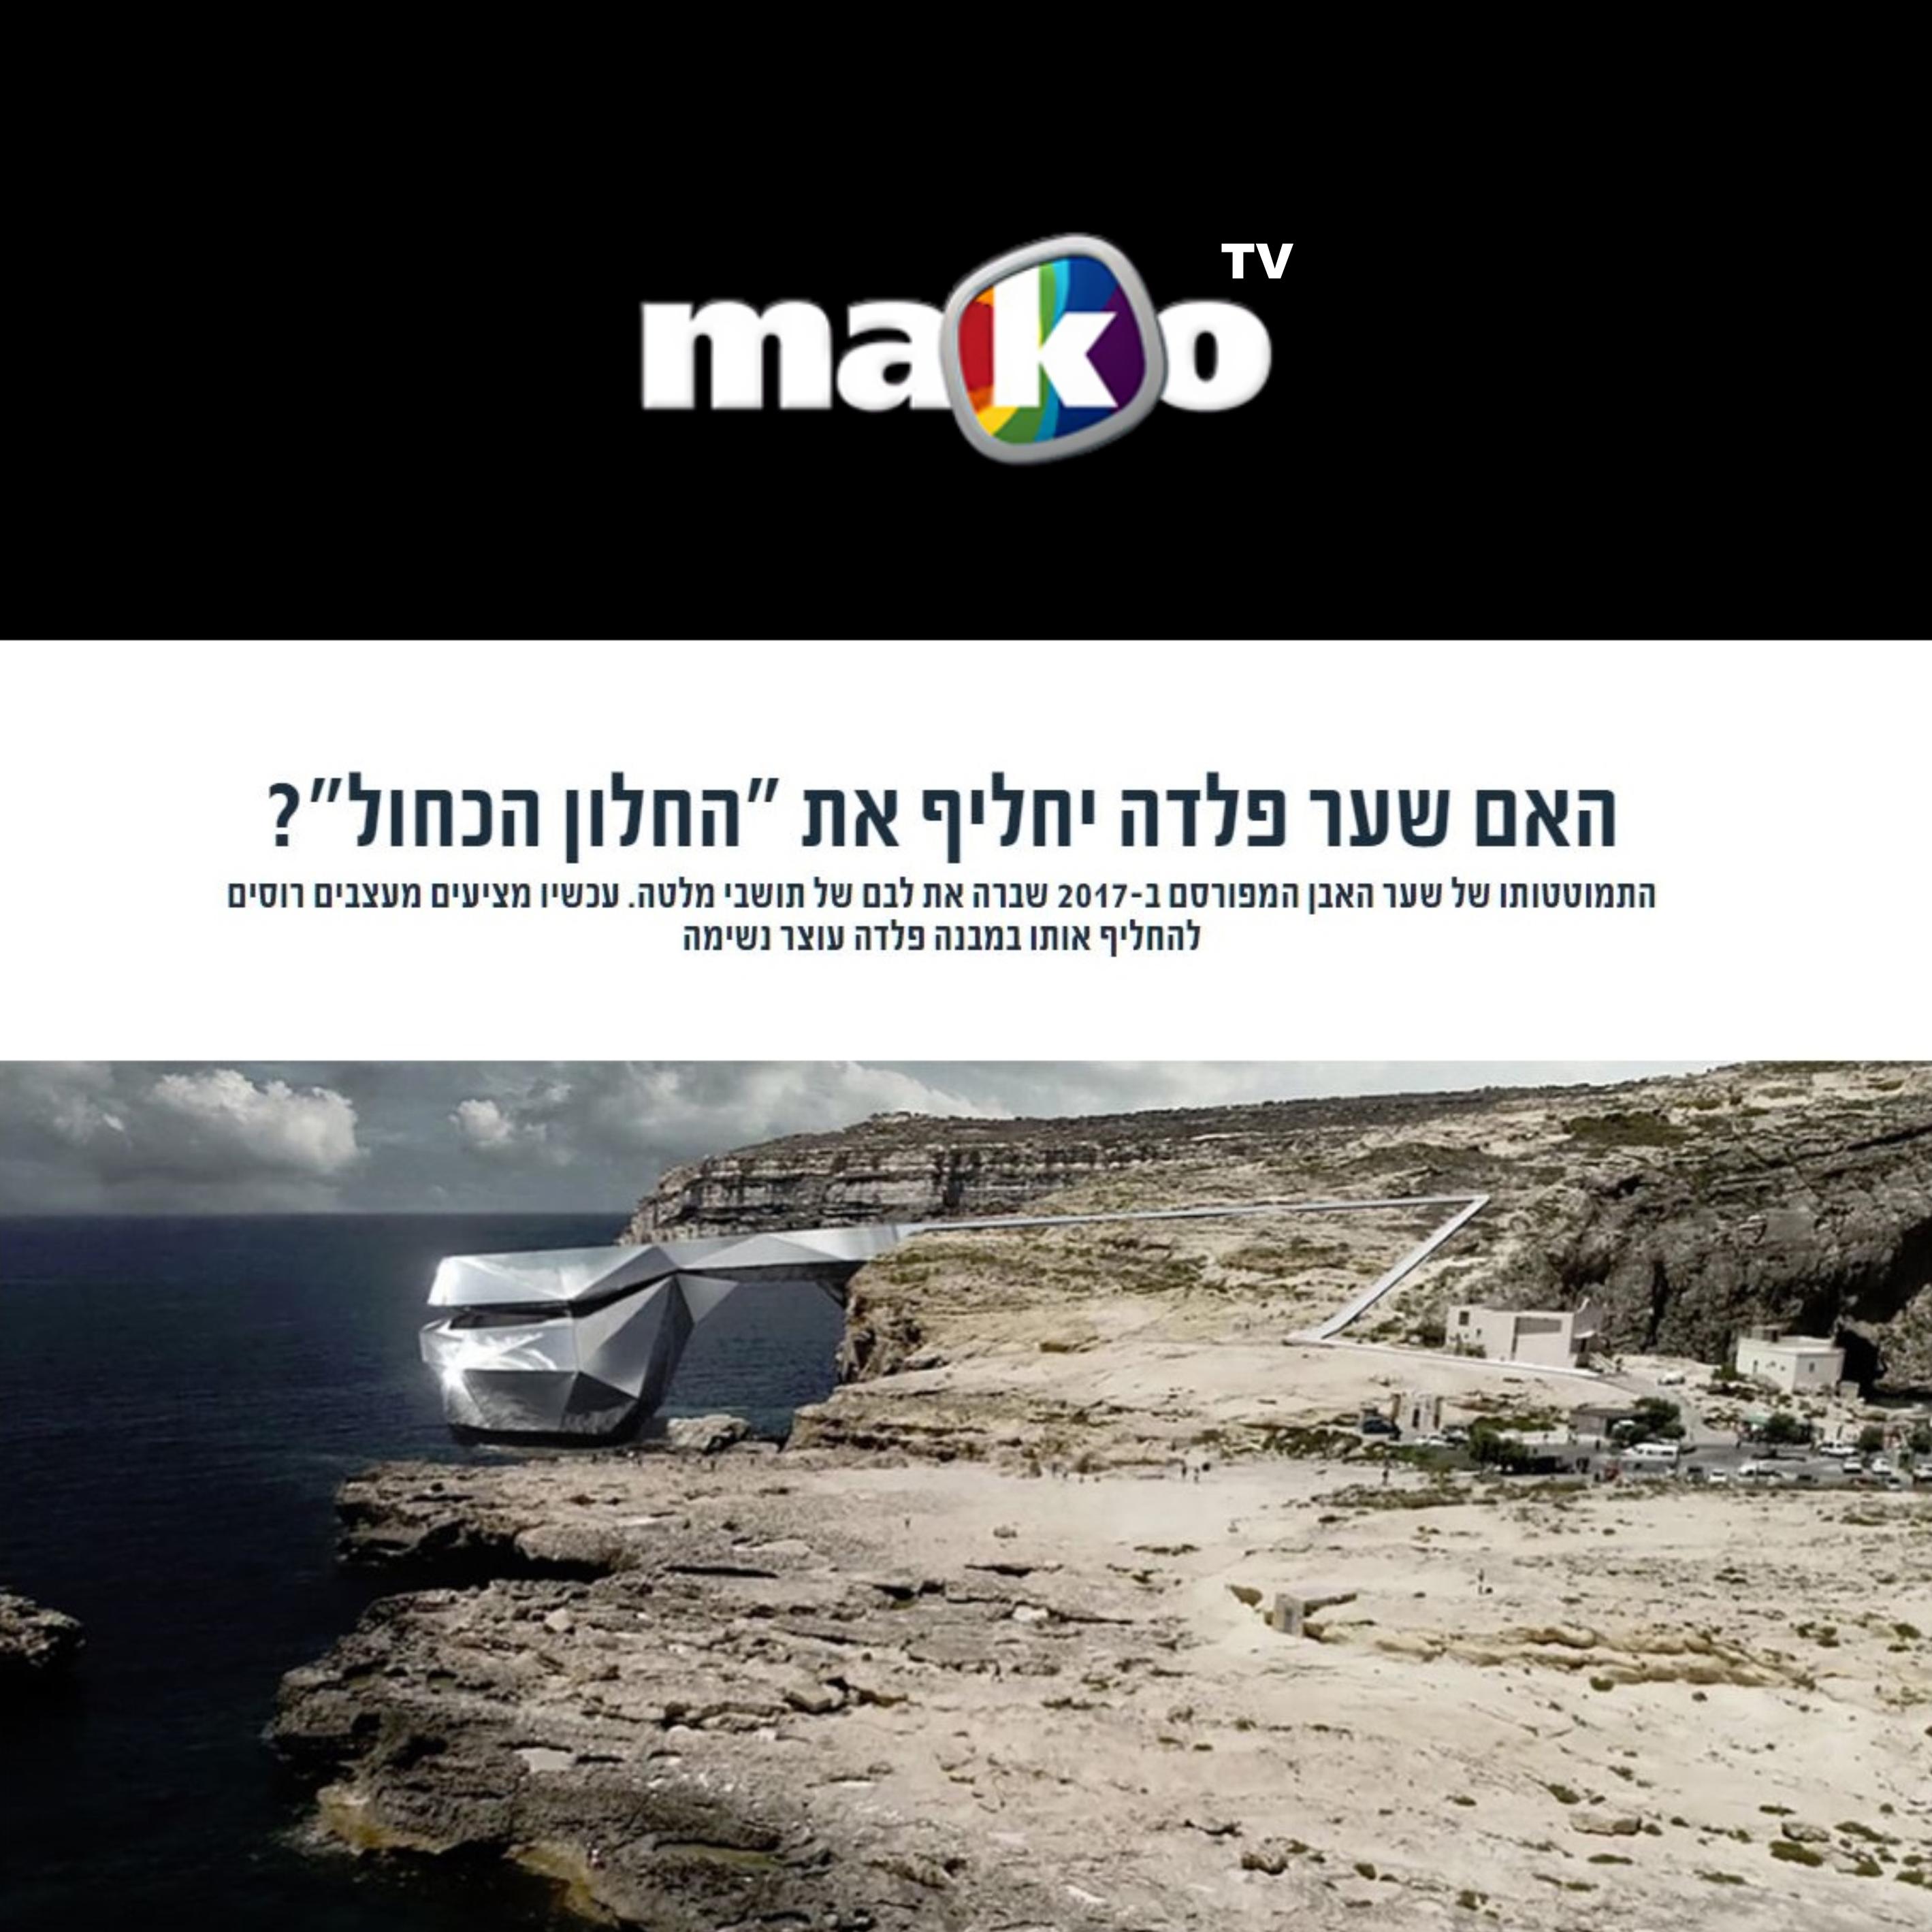 MAKO Israel